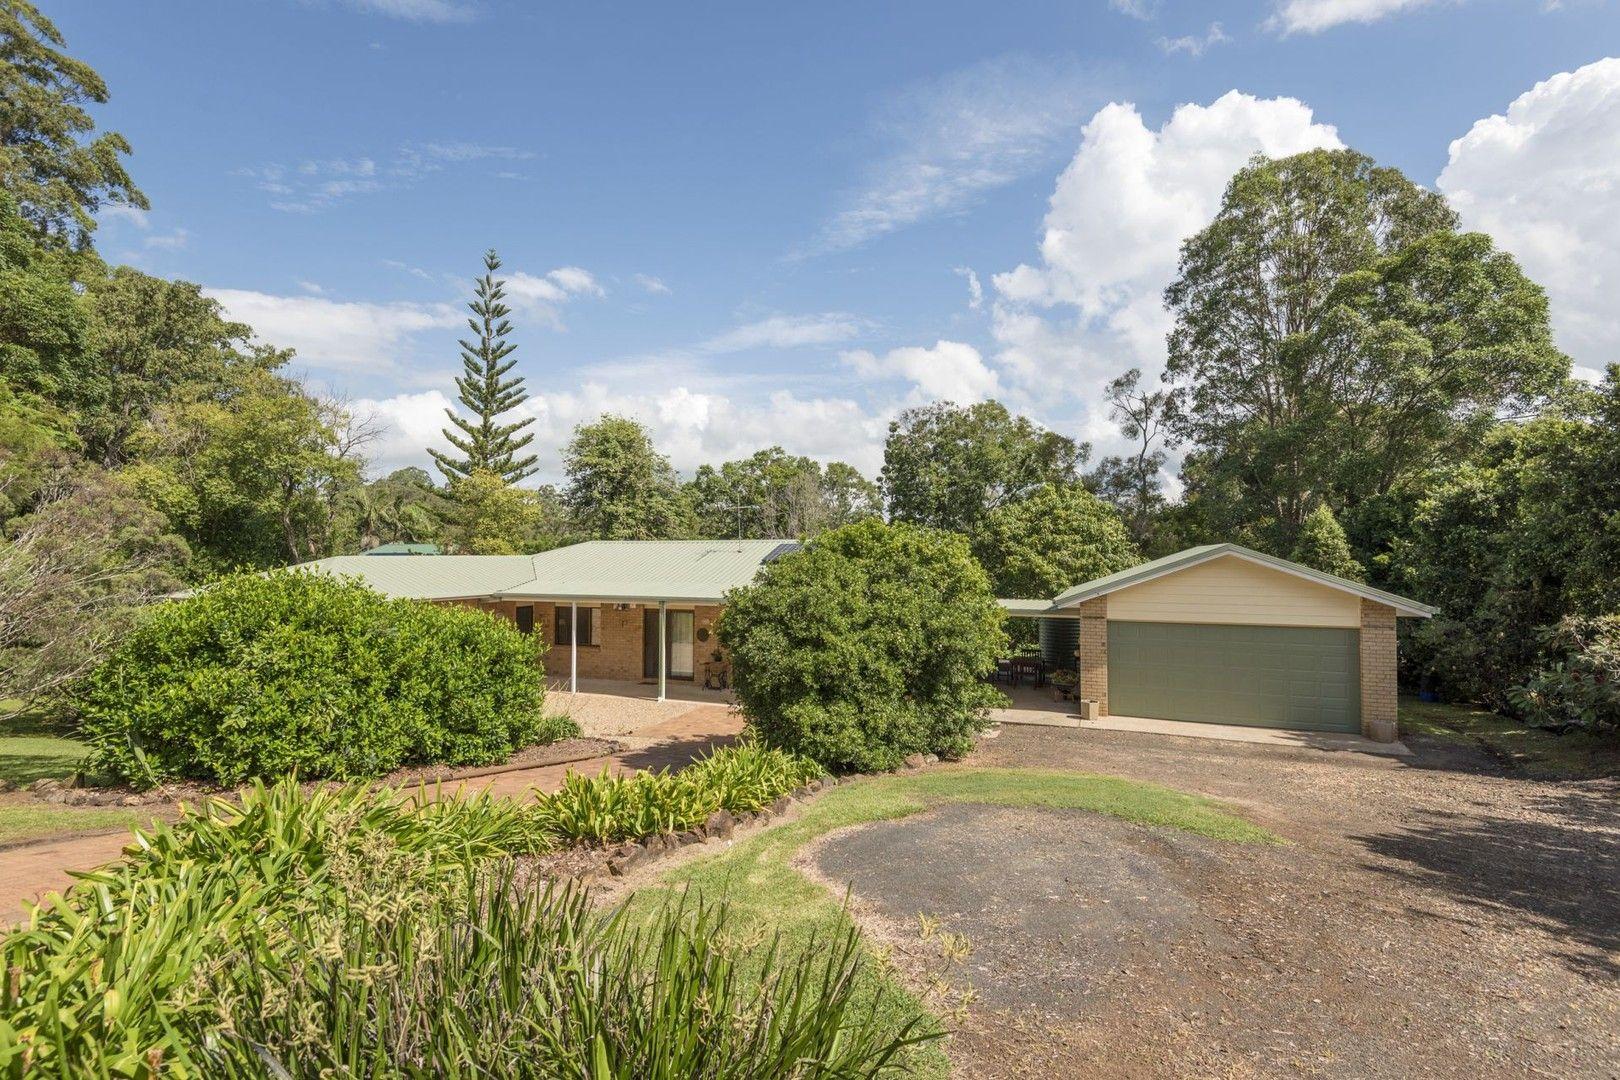 13 Funnell Drive, Modanville NSW 2480, Image 0